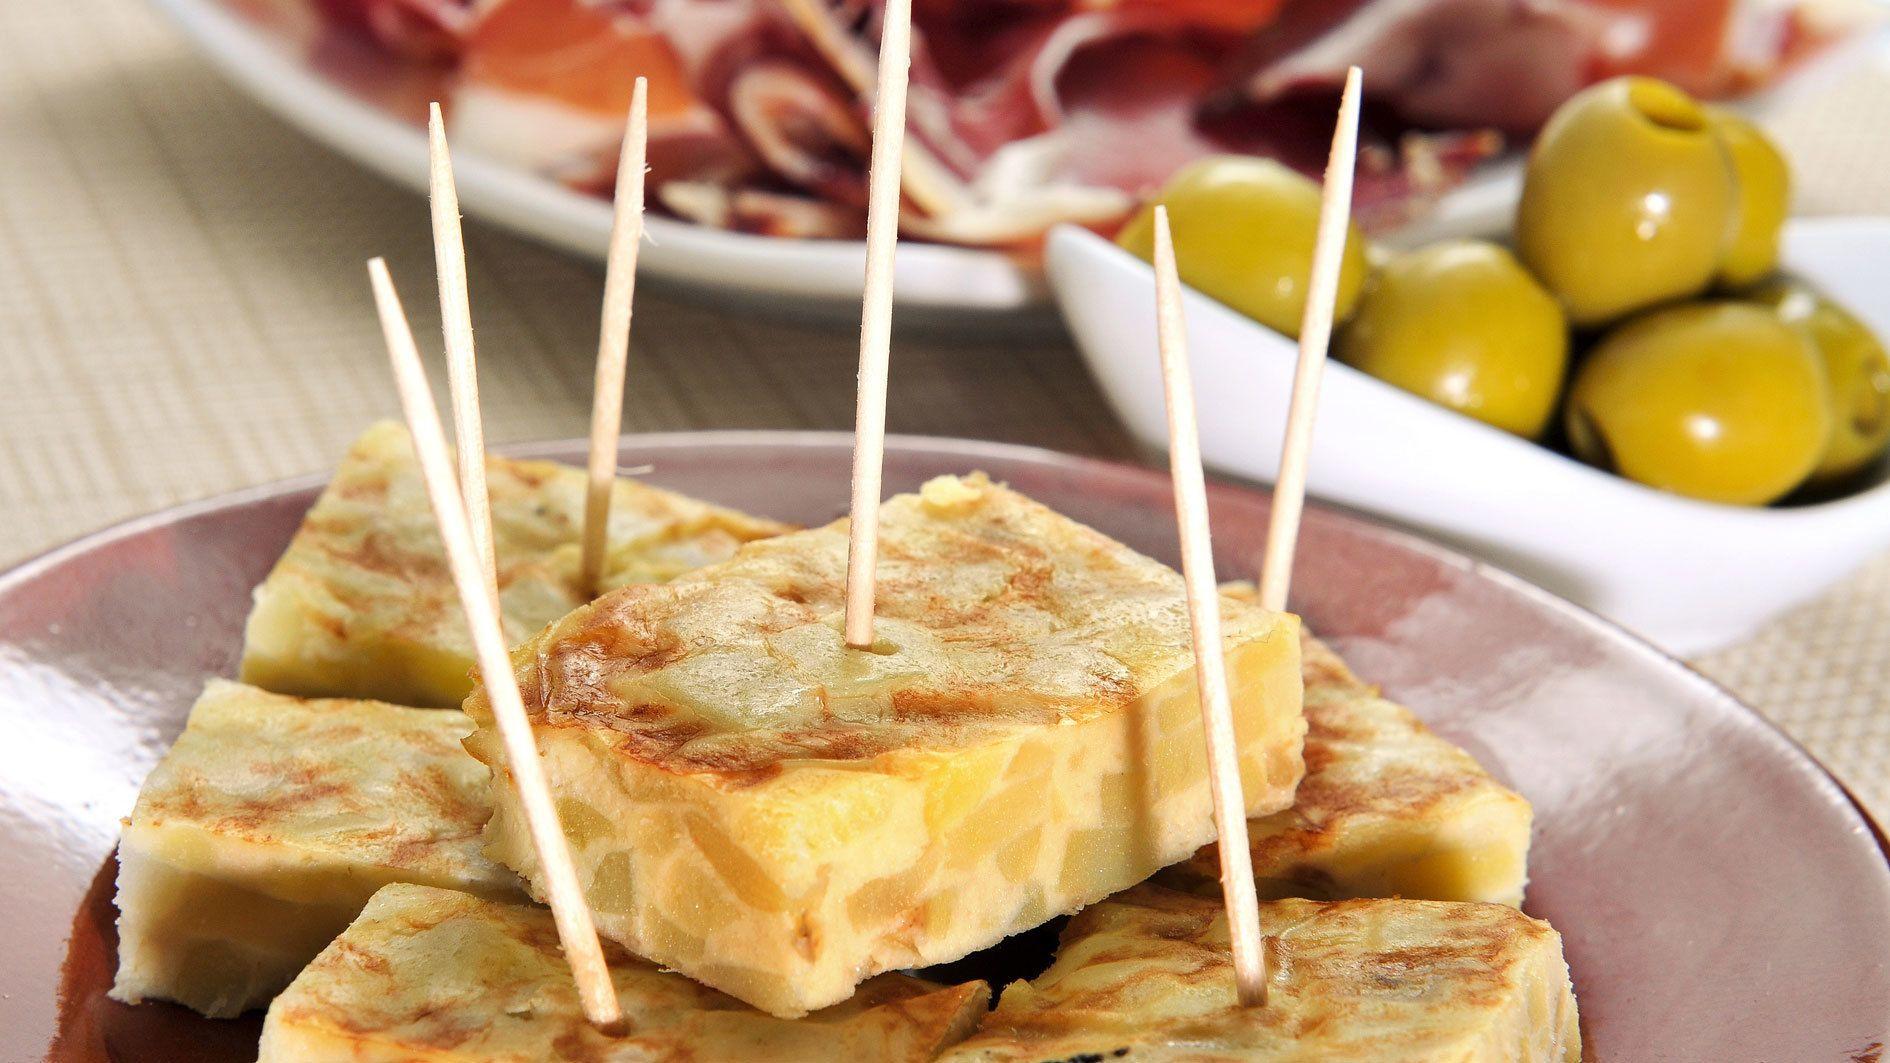 finger foods and olives at food tour in Barcelona